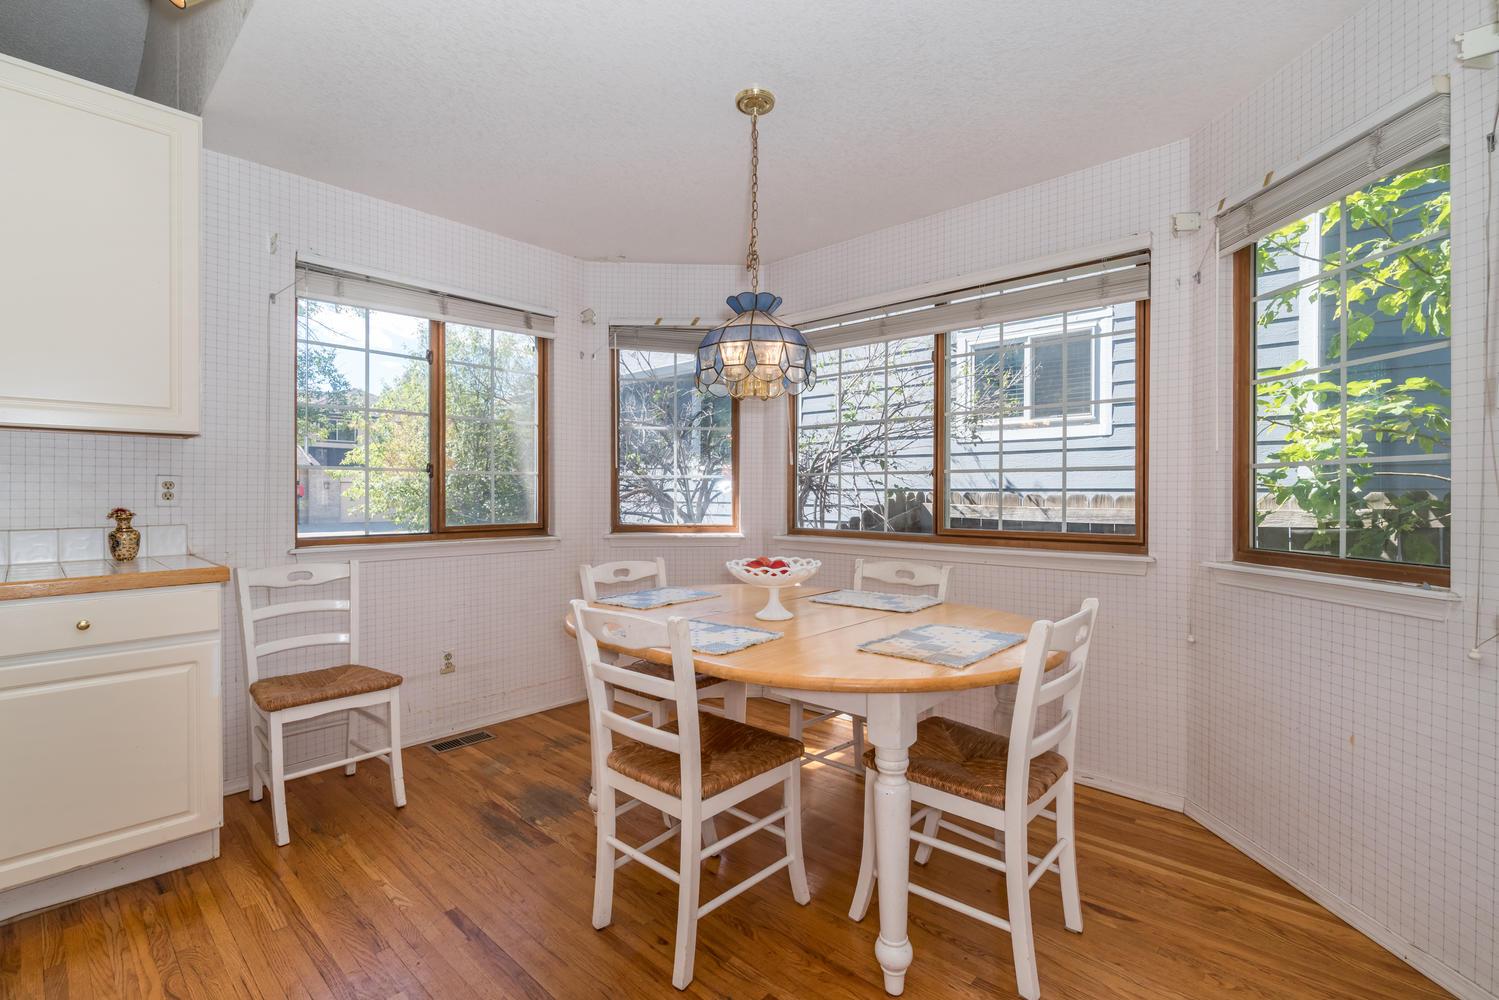 Bright white kitchen in apartment